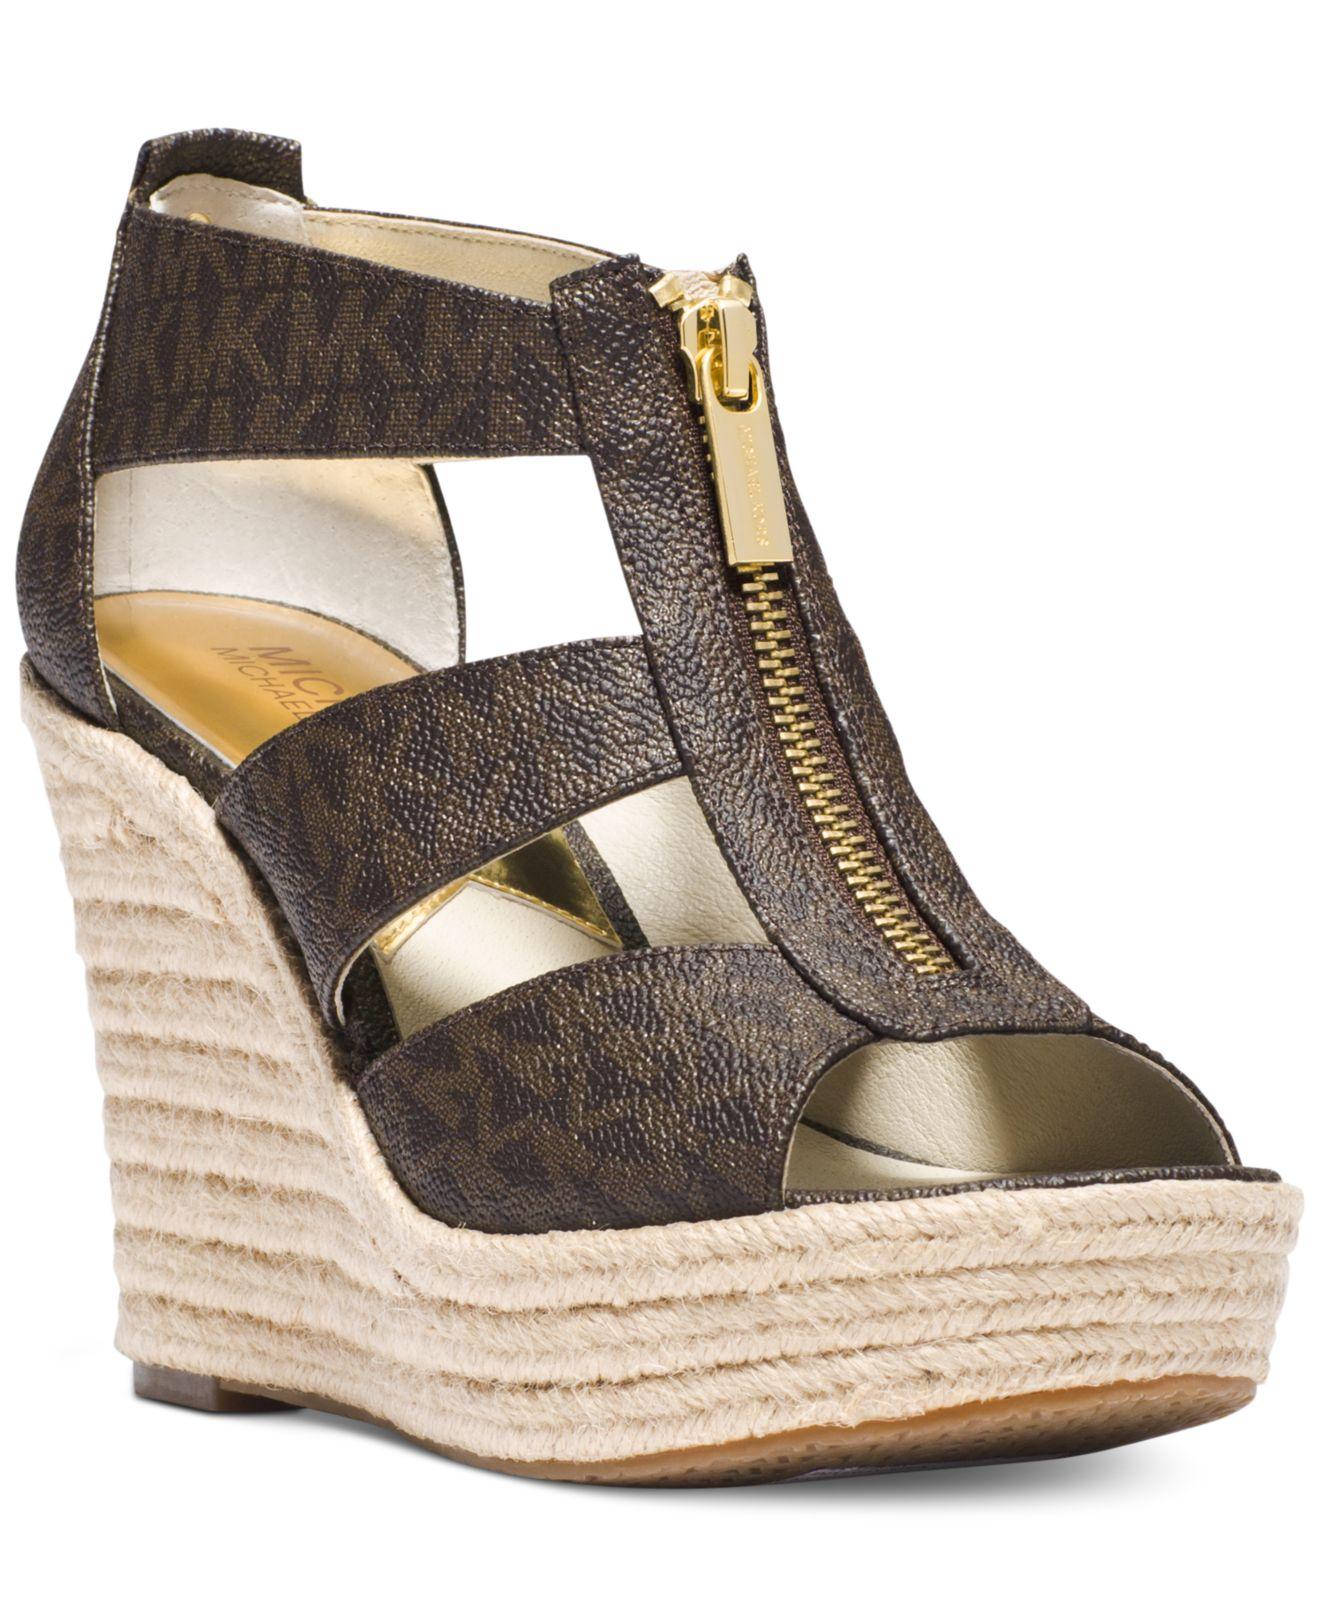 Lyst - Michael Kors Michael Damita Platform Wedge Sandals ...